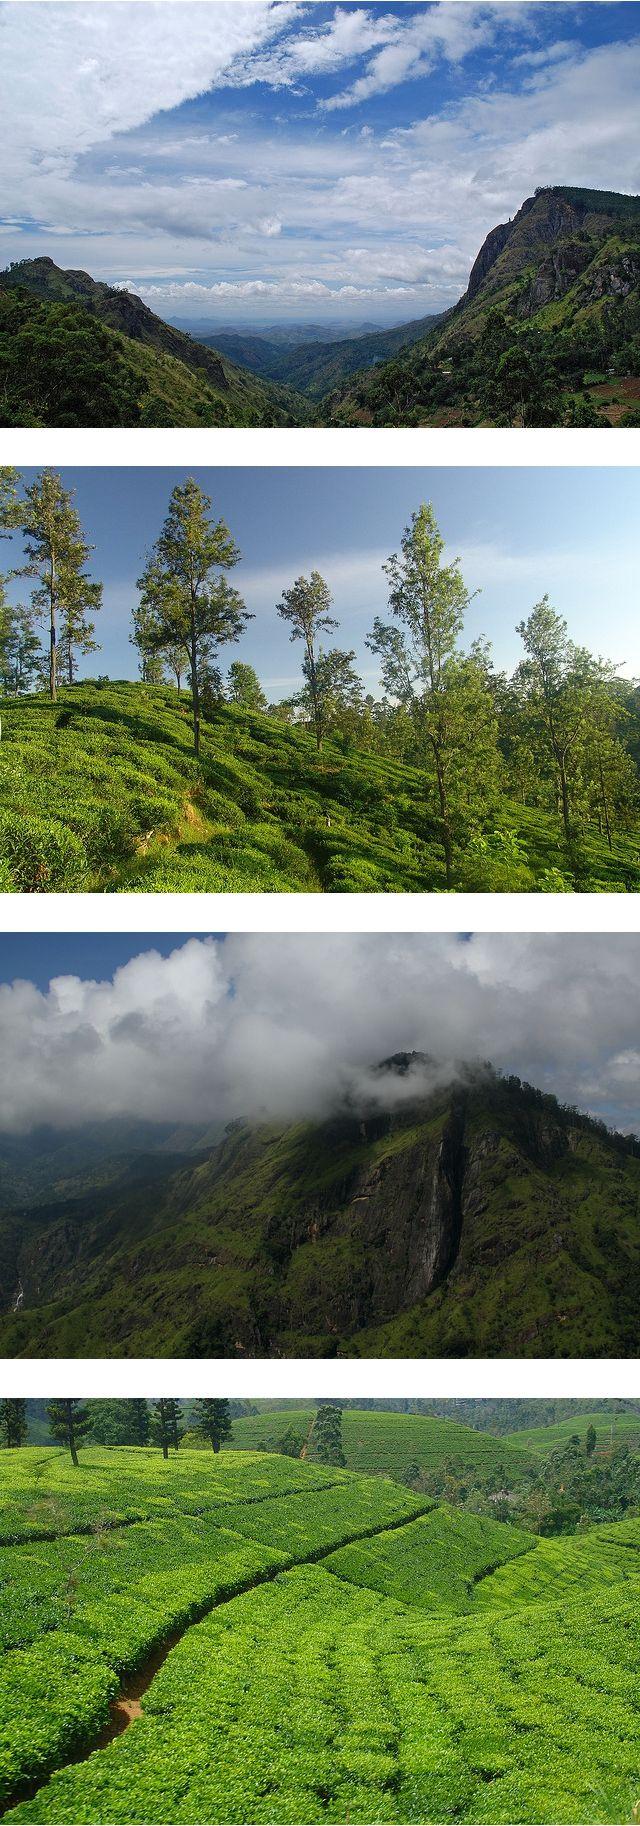 Ella, Sri Lanka #SriLanka #Ella #TeaCountry